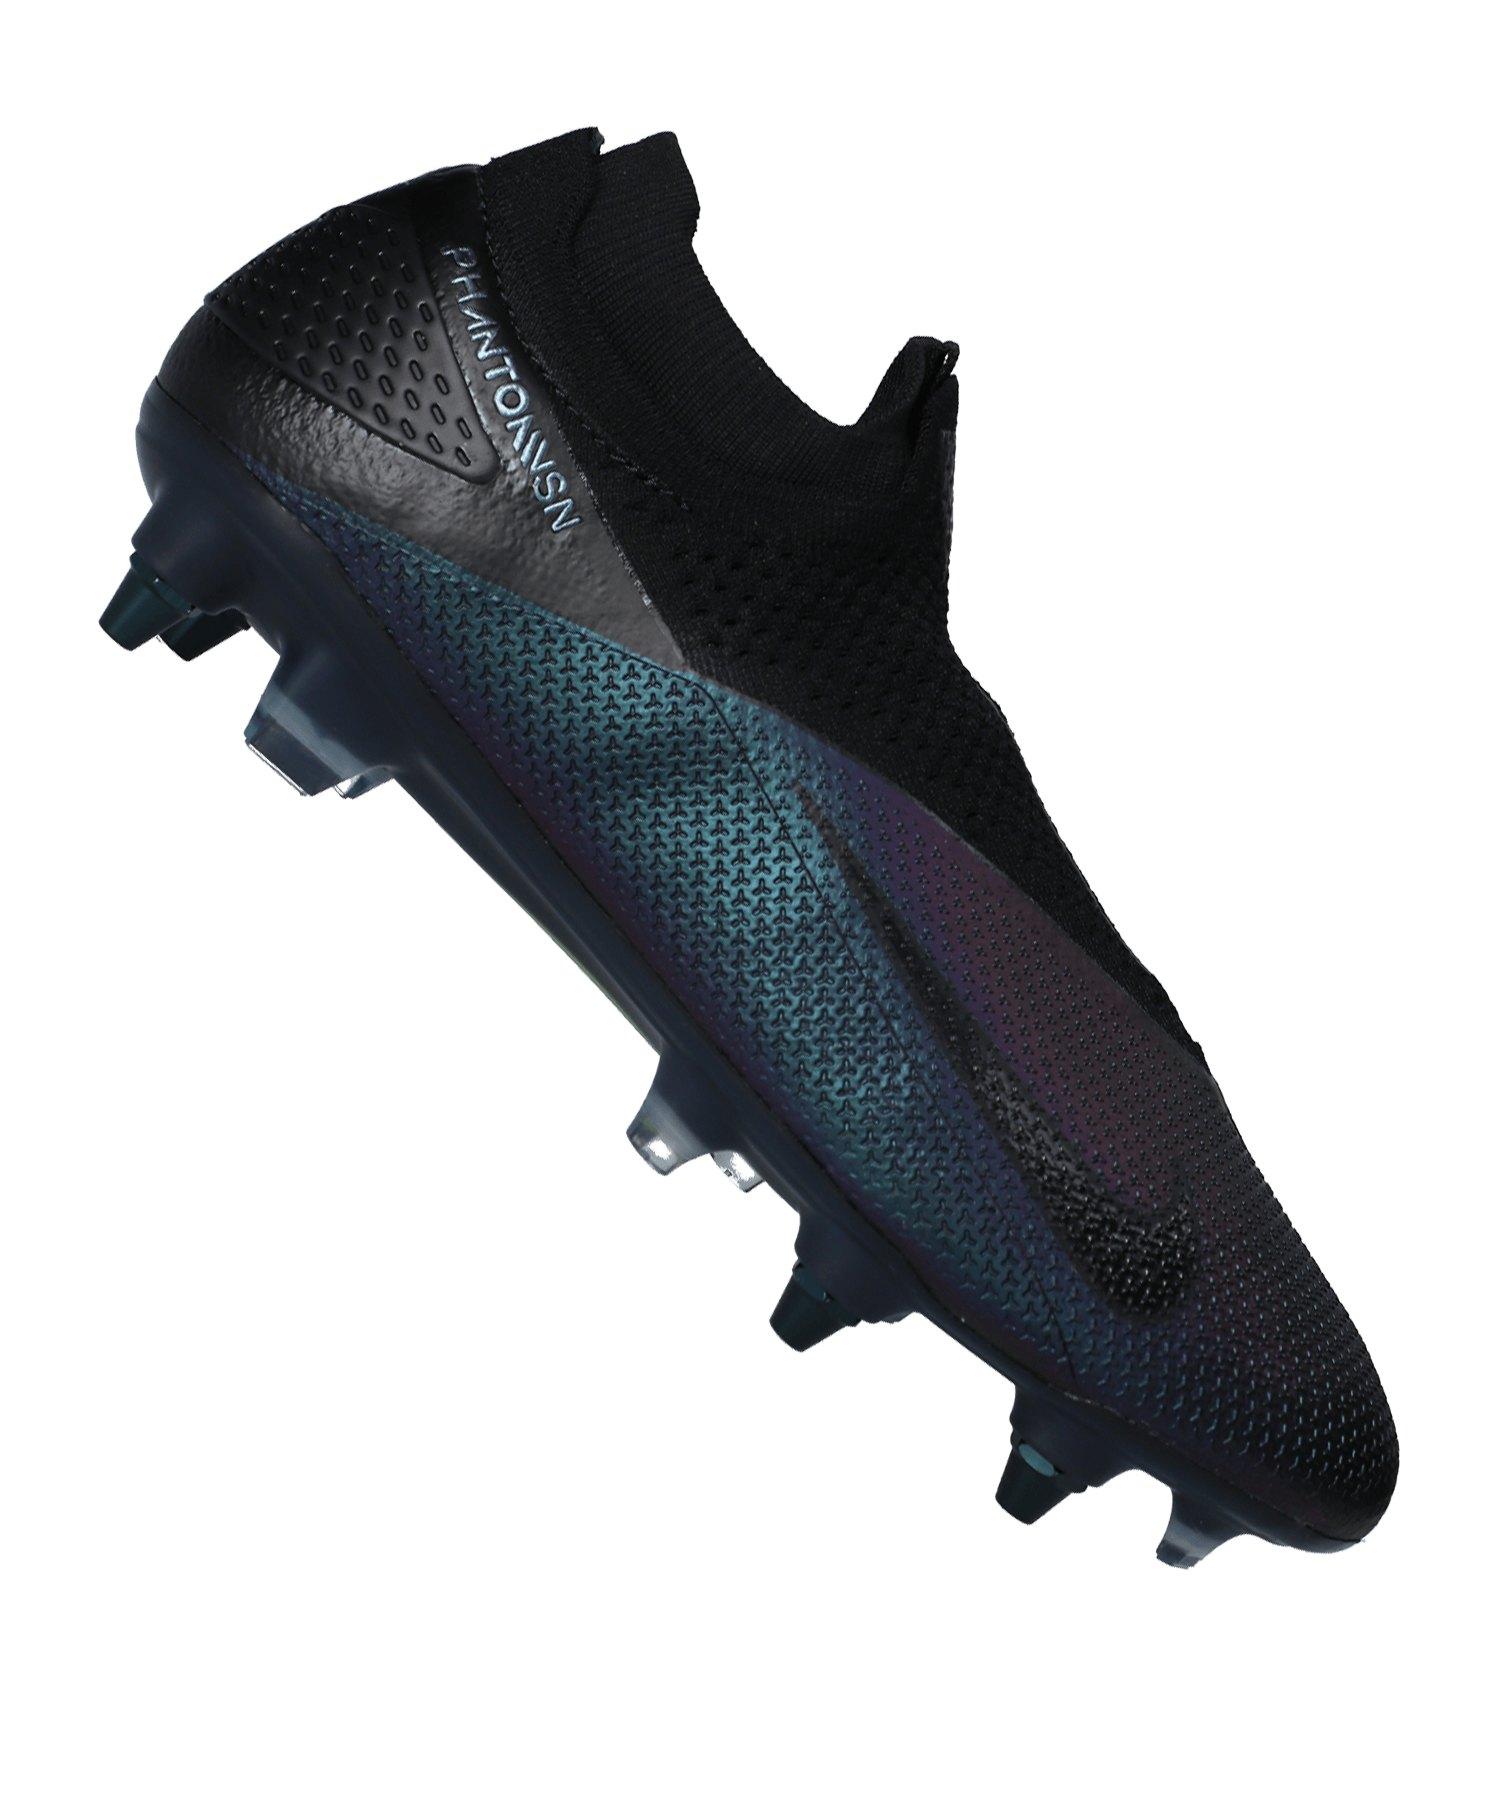 Nike Phantom Vision II Kinetic Black Elite DF SG-Pro AC Schwarz F010 - schwarz